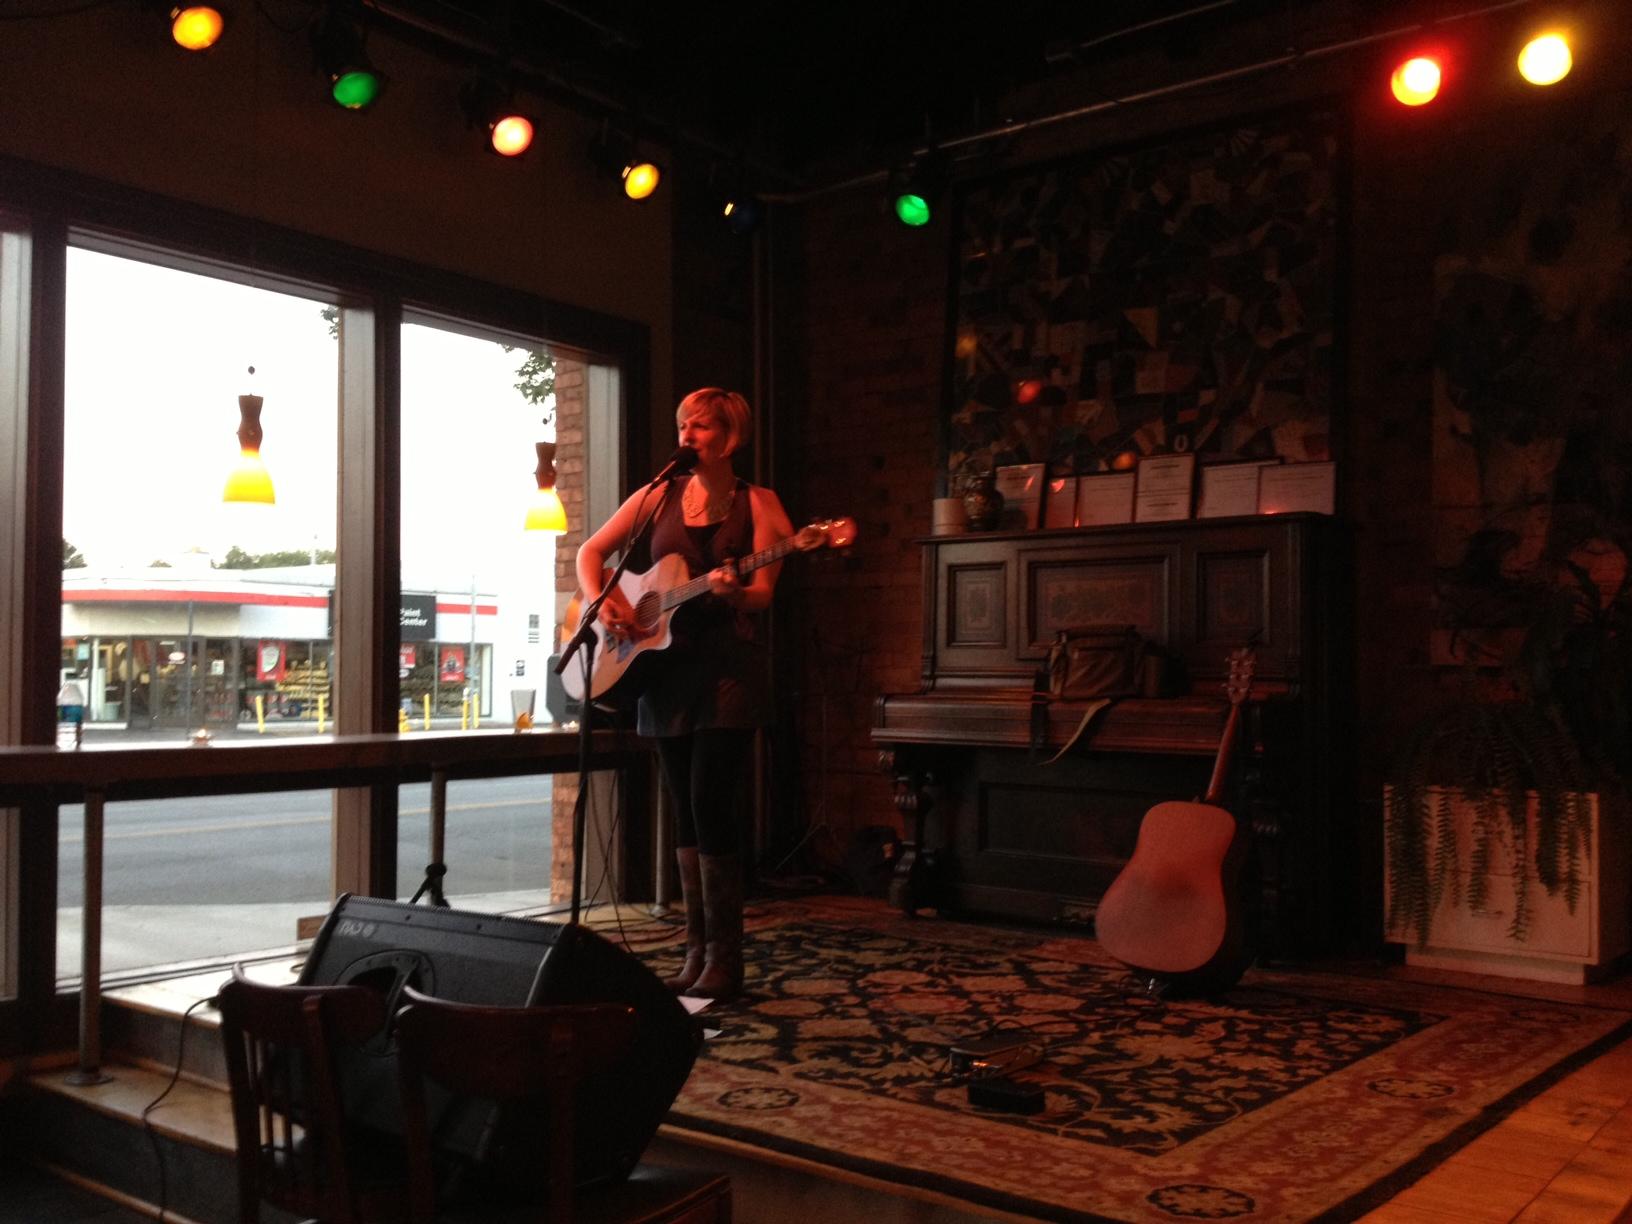 TOUR DIARY: MON 8/5 @ BOULDER COFFEE CO (Rochester, NY)